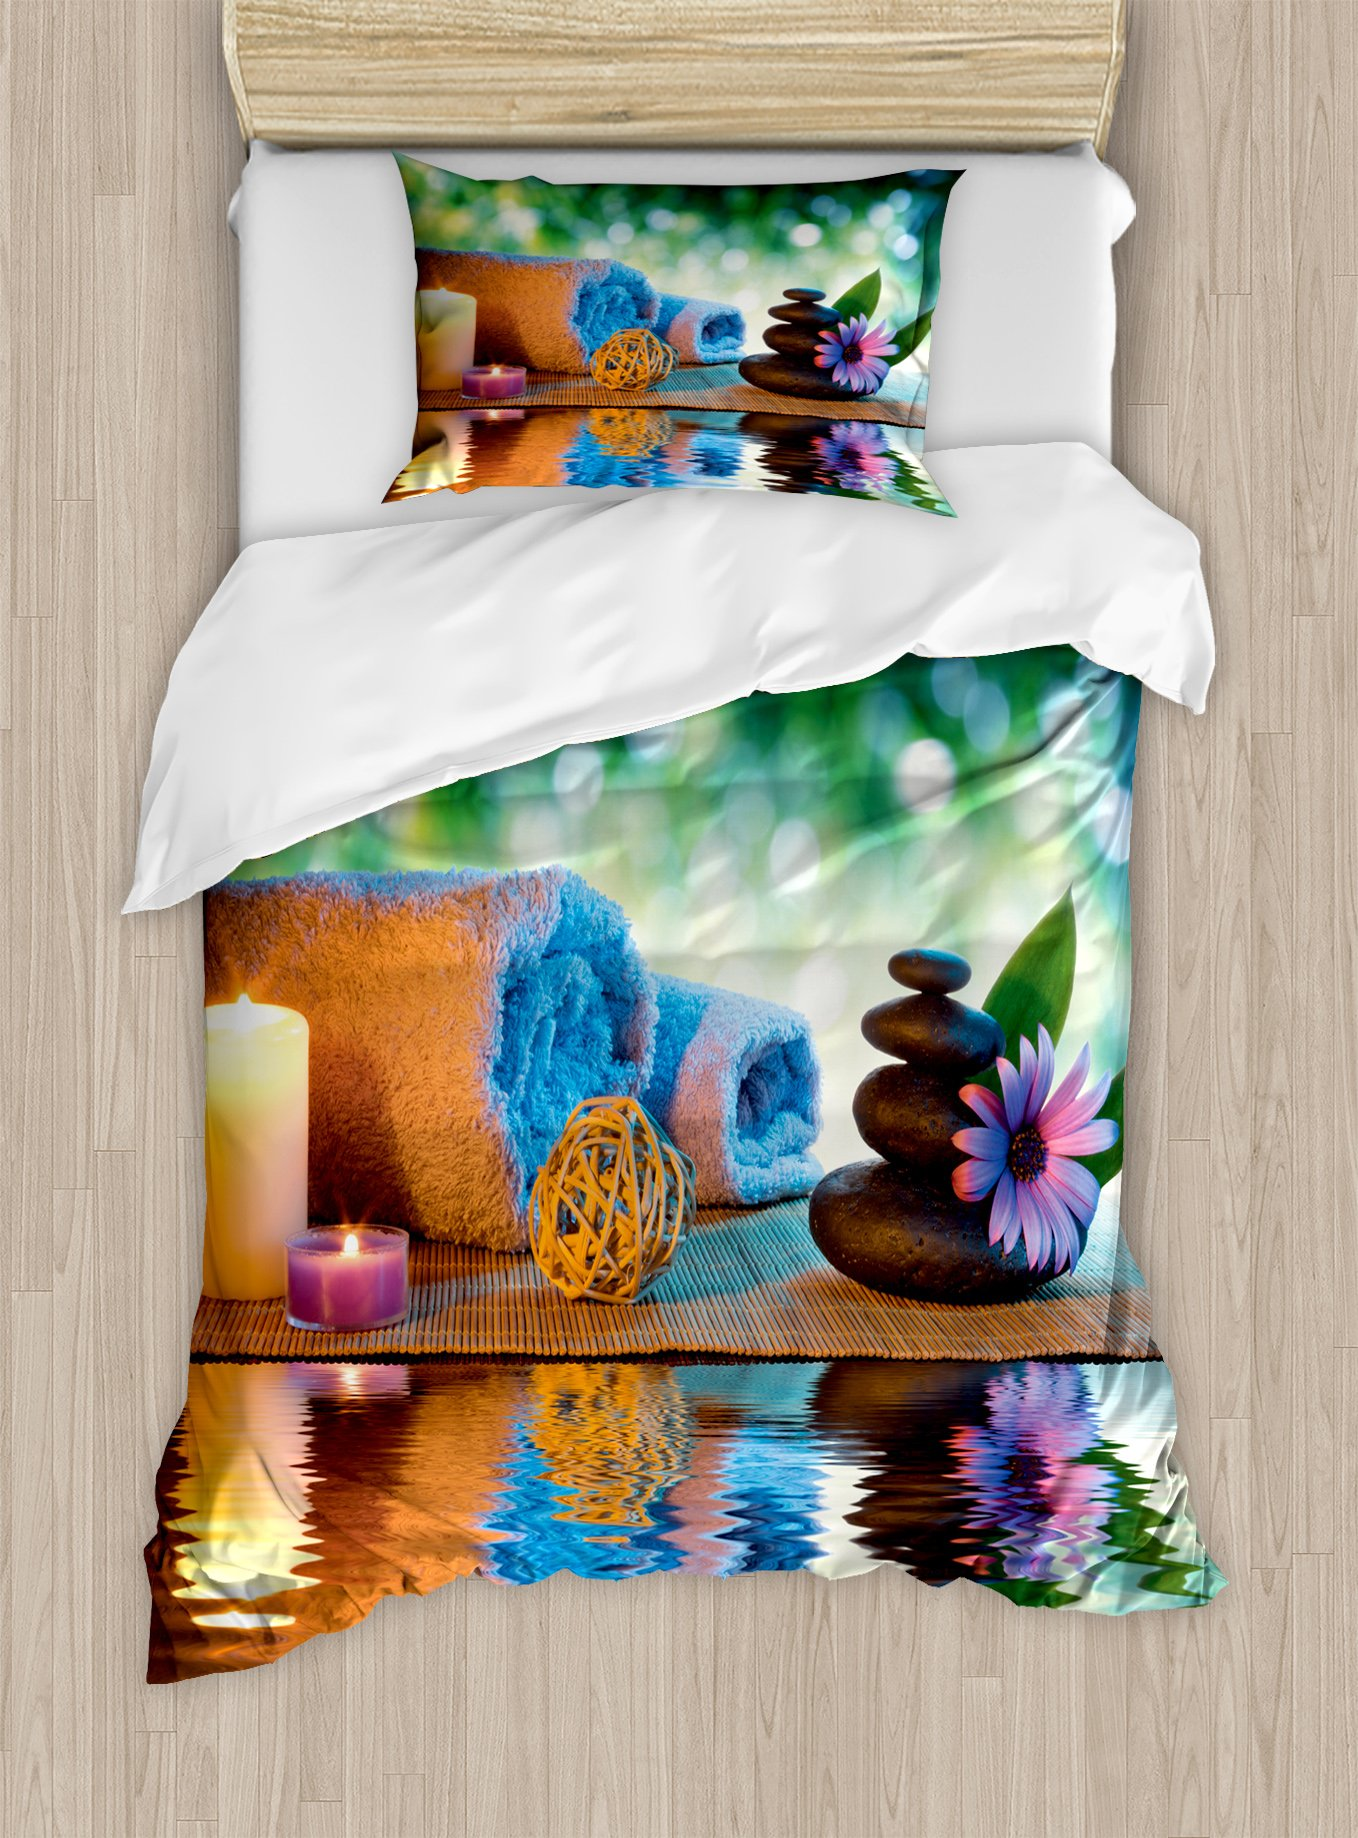 Lunarable Spa Duvet Cover Set Twin Size, Asian Culture Inspiration Chinese Japanese Candles Zen Meditation Stones, Decorative 2 Piece Bedding Set with 1 Pillow Sham, Green Orange Lavander